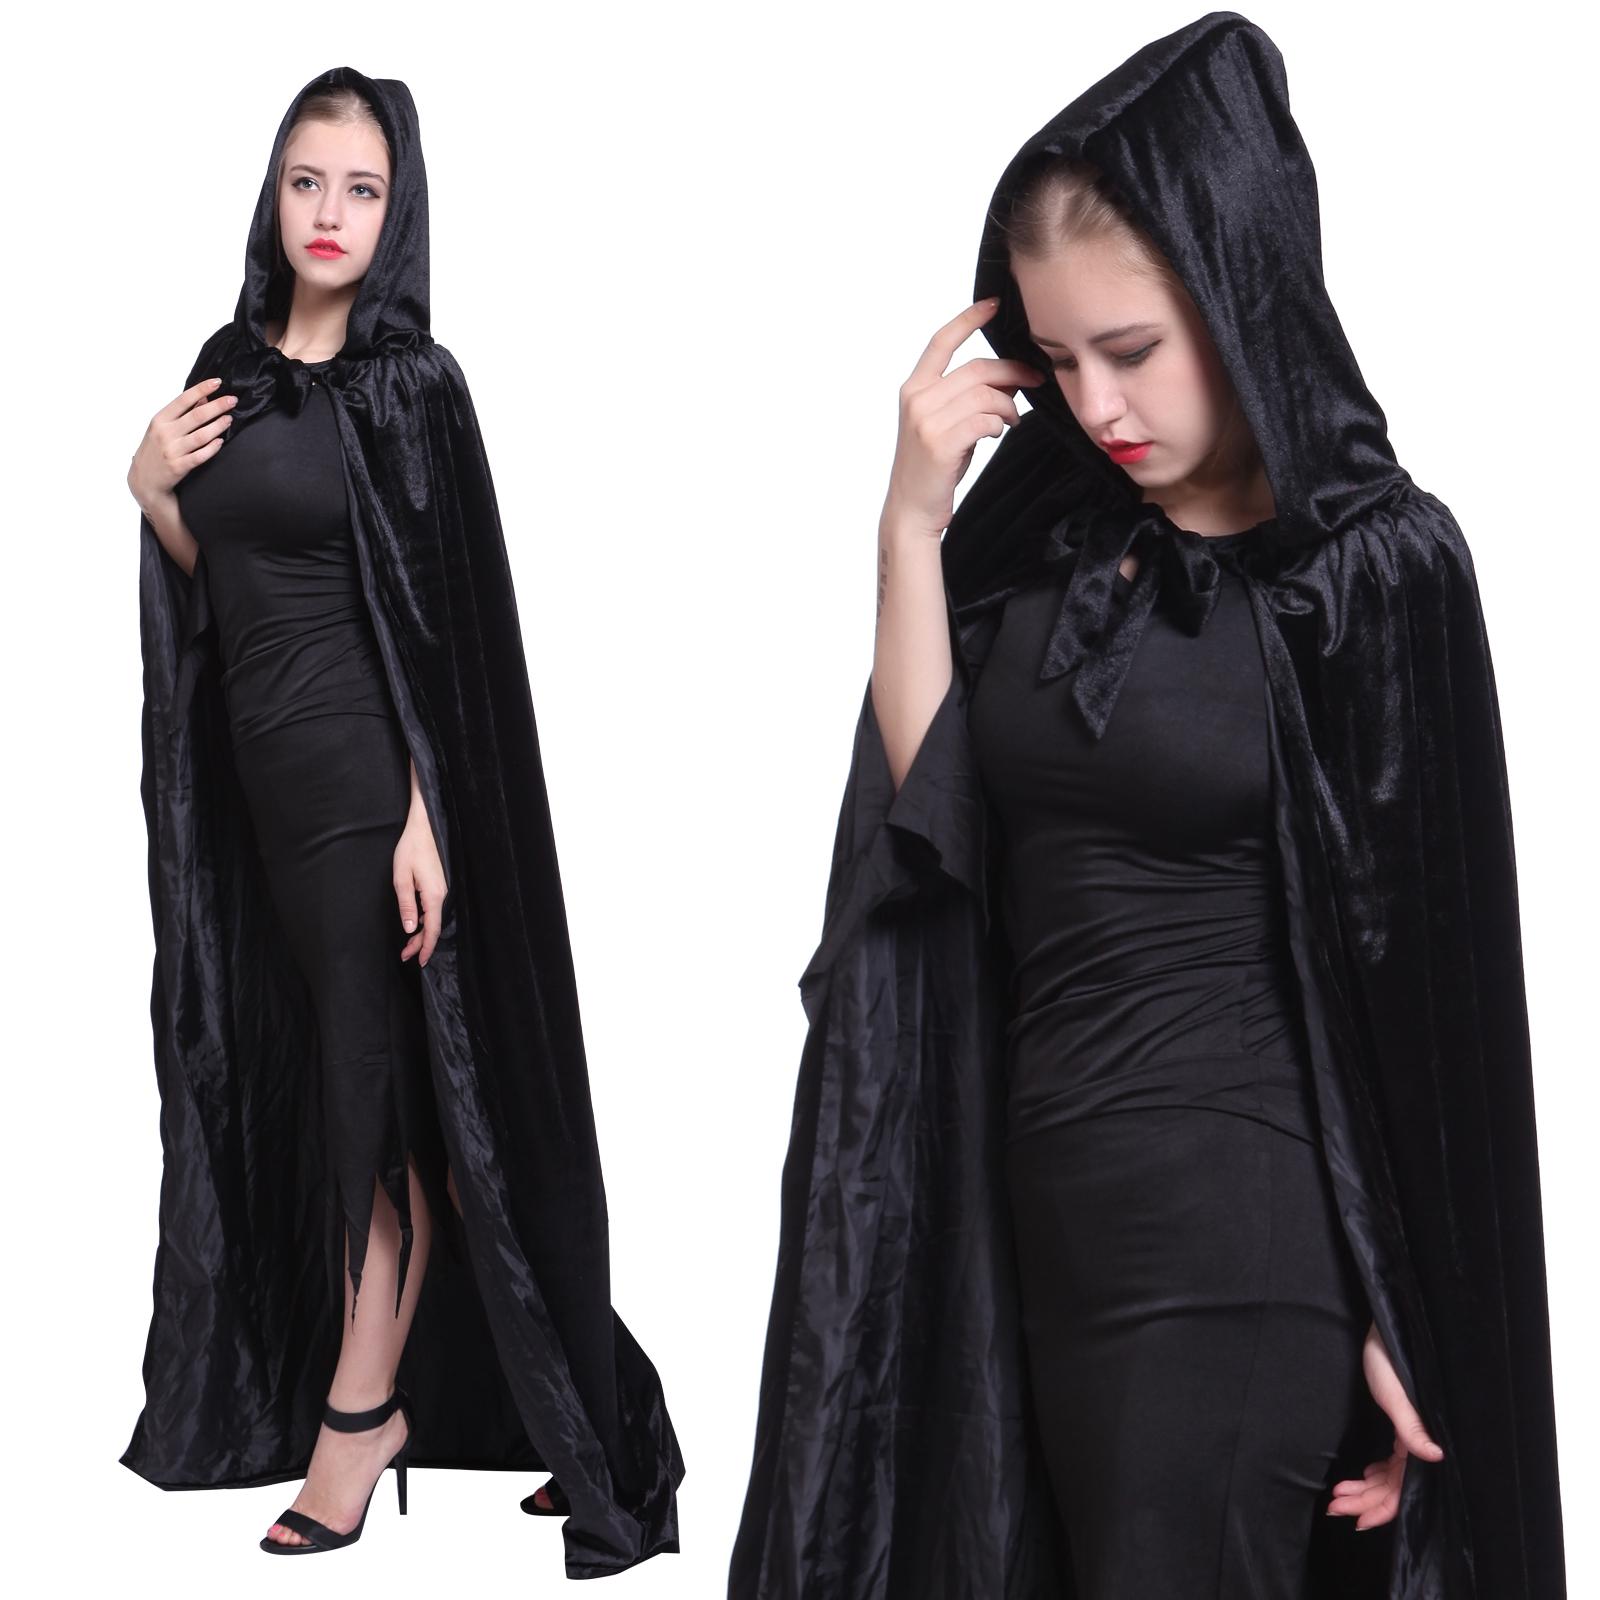 mantel cape umhang vintage mittelalter gothic fasching. Black Bedroom Furniture Sets. Home Design Ideas